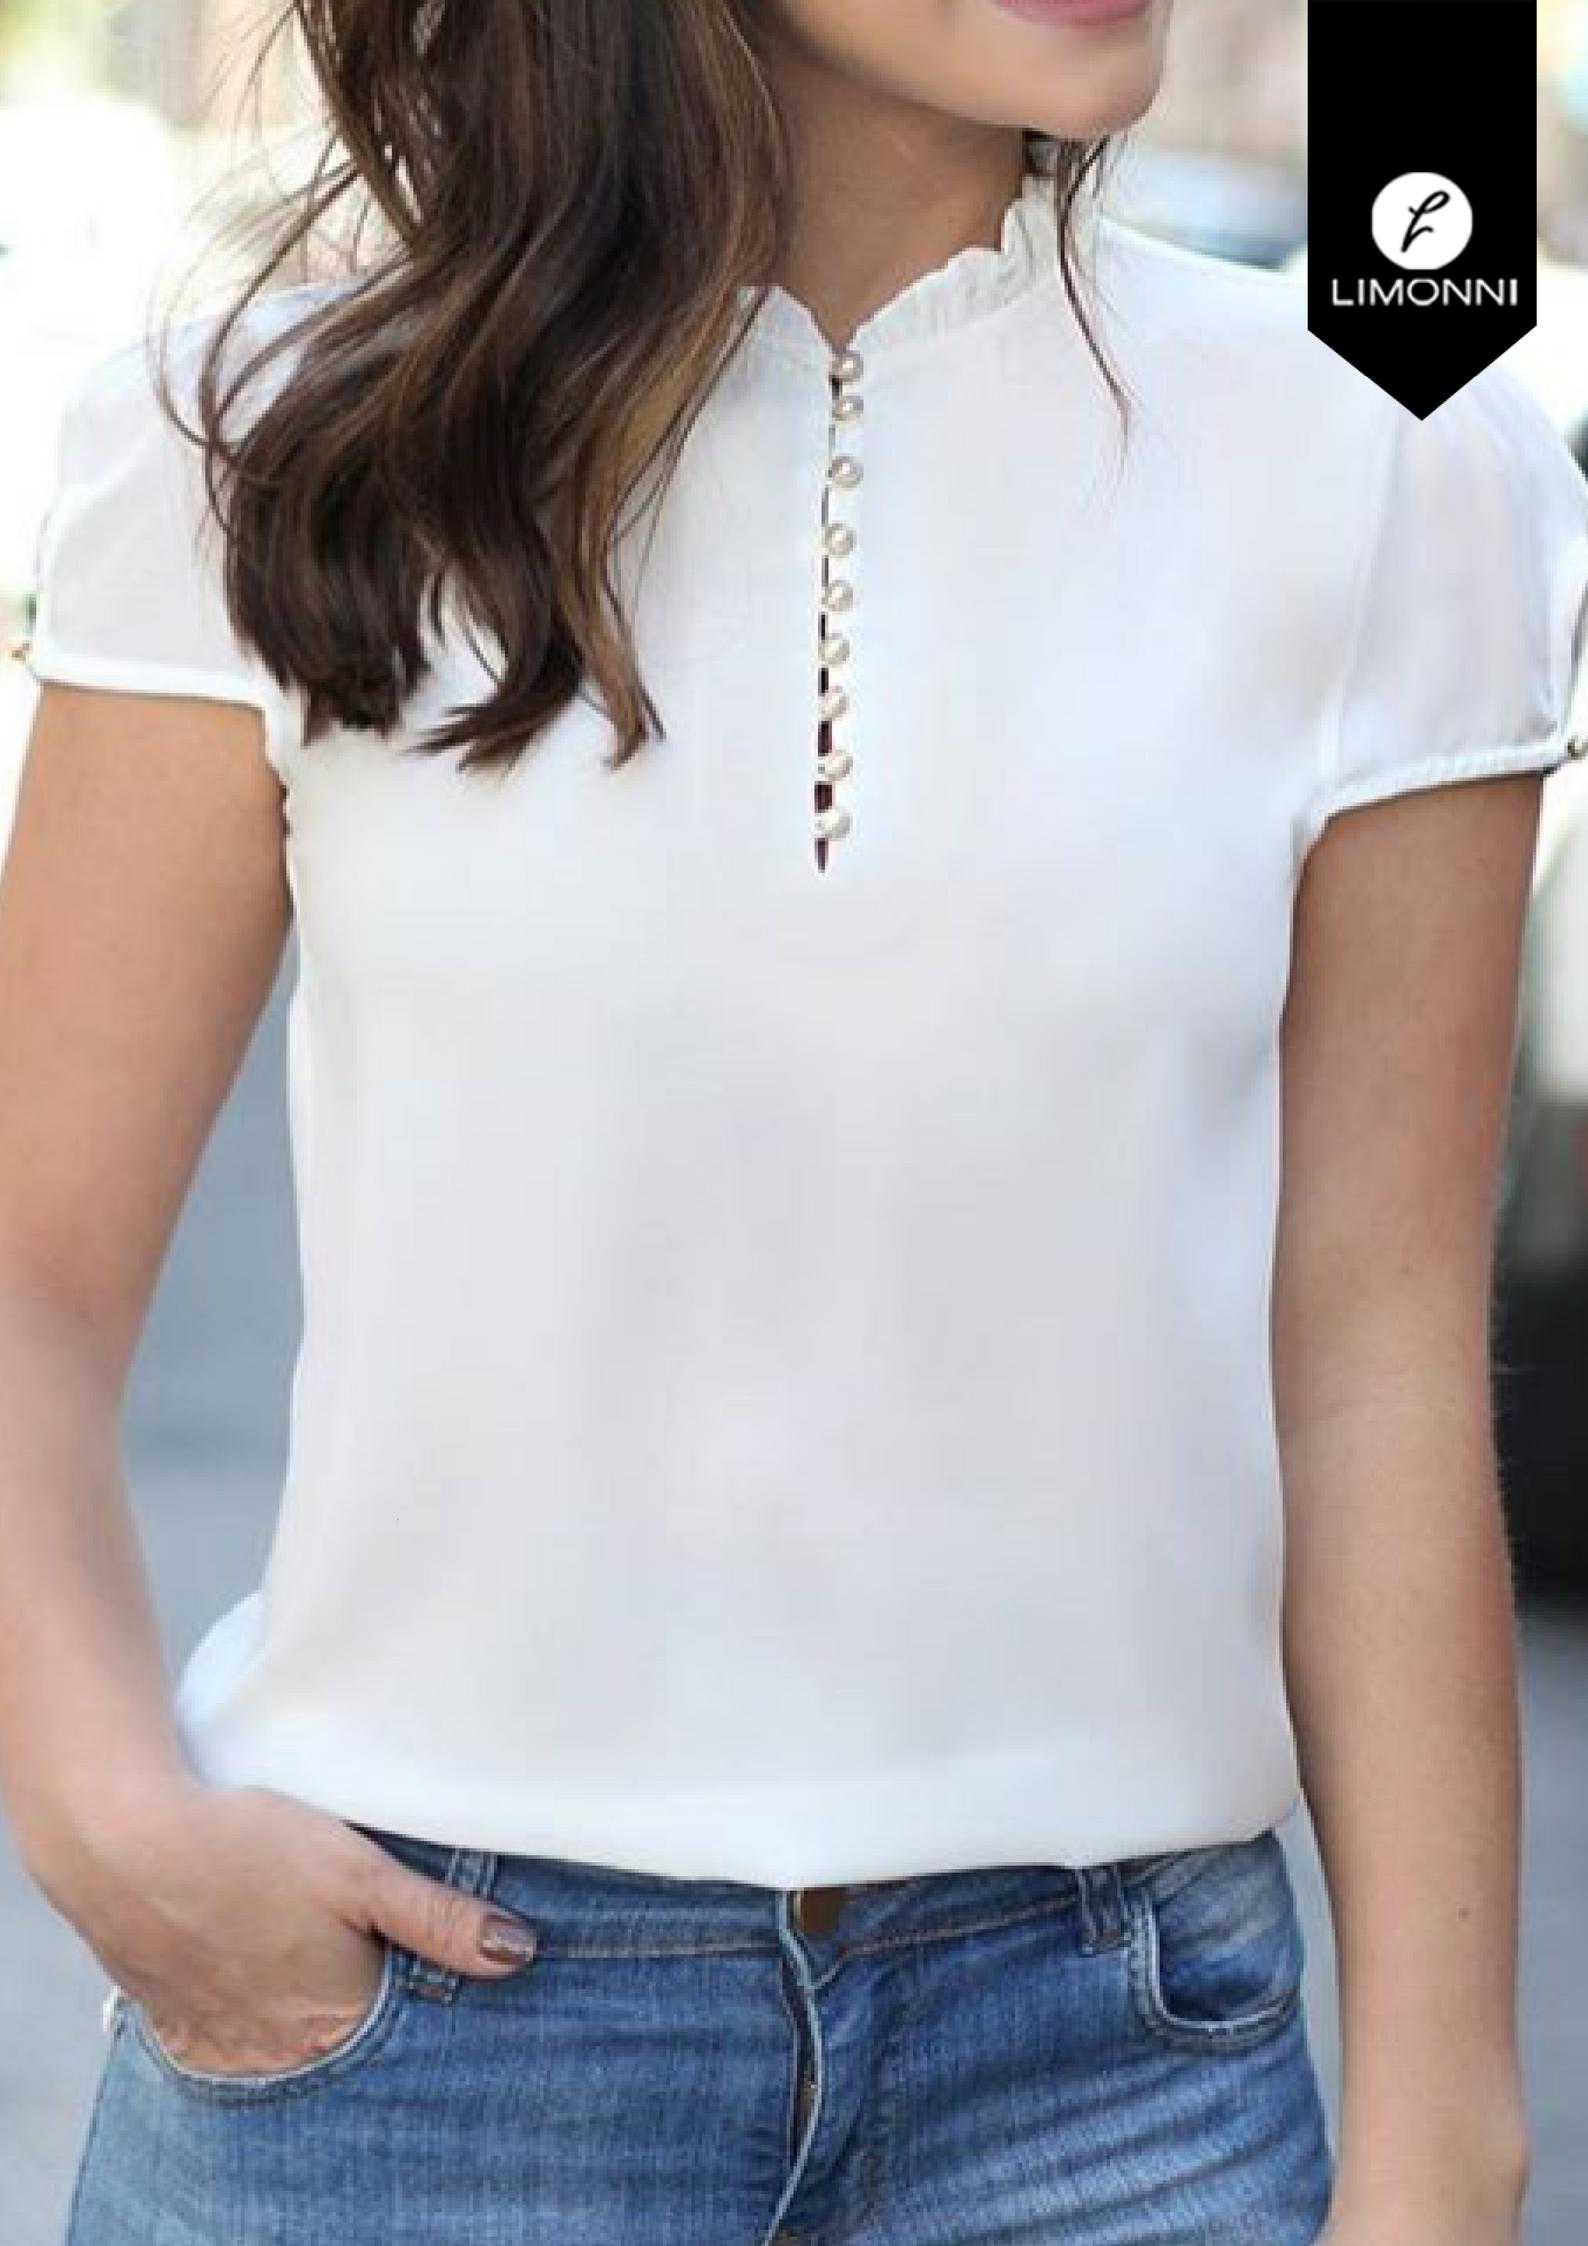 Blusas para mujer Limonni Bennett LI1379 Campesinas